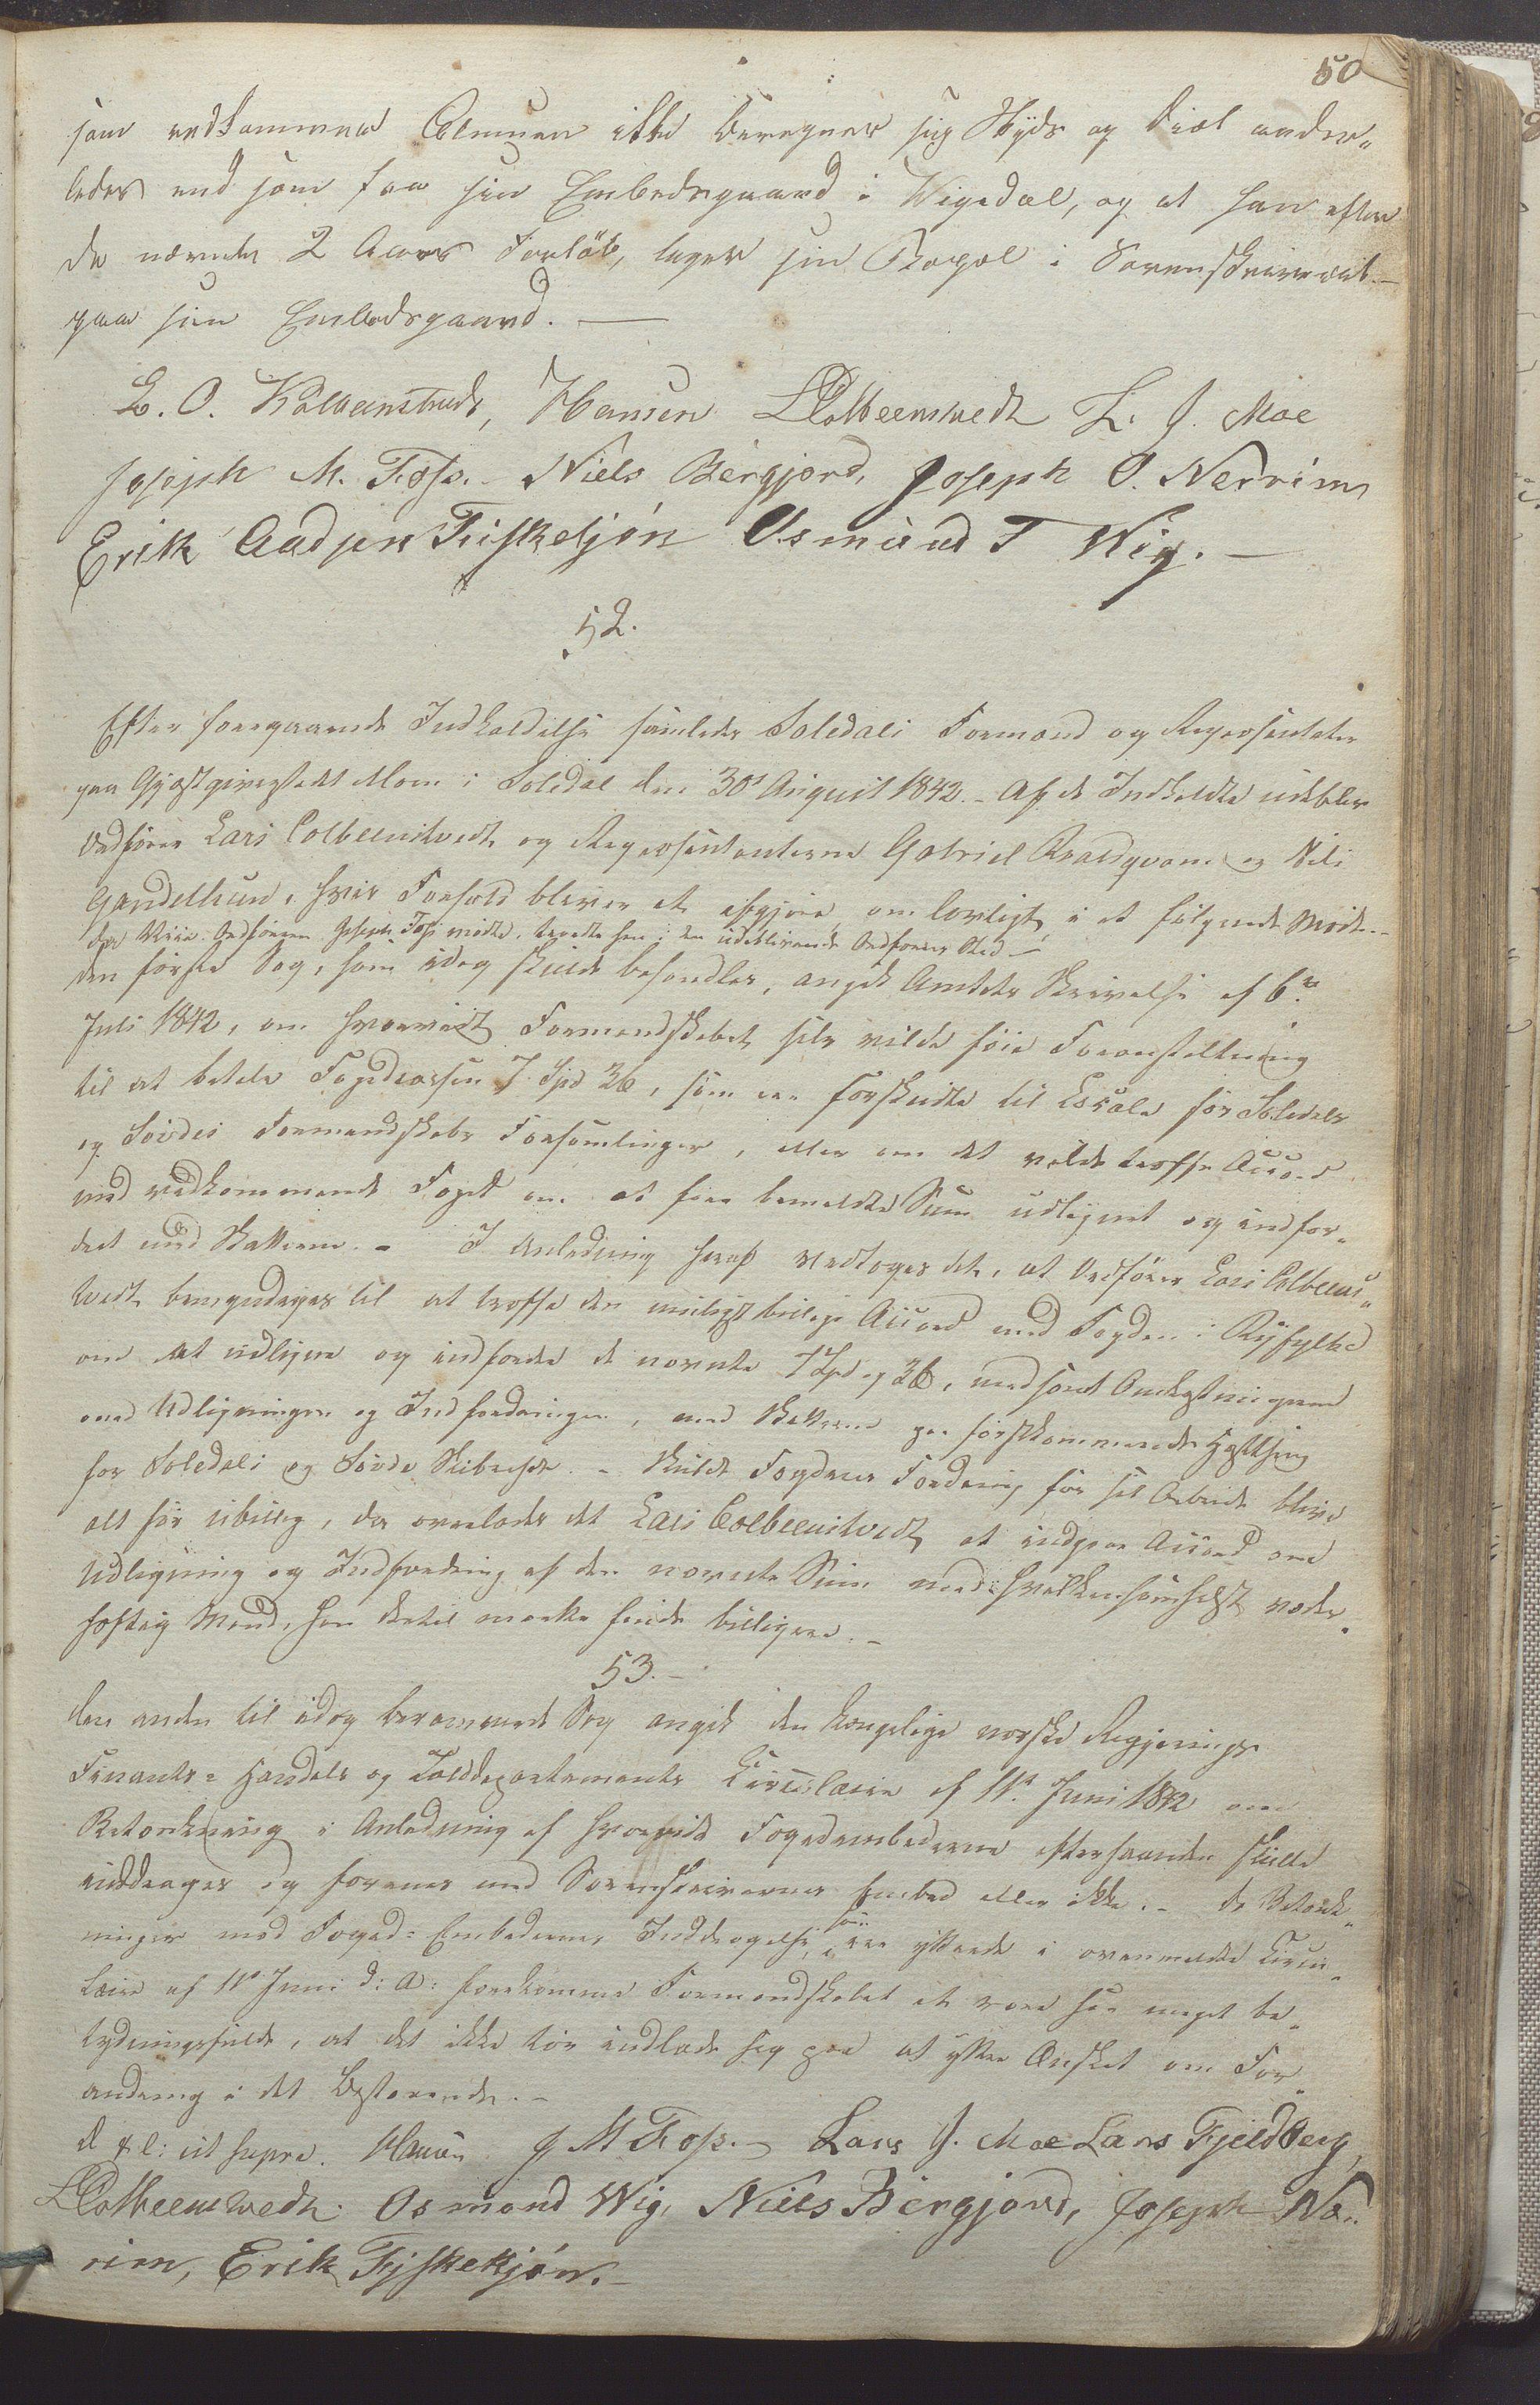 IKAR, Suldal kommune - Formannskapet/Rådmannen, A/Aa/L0001: Møtebok, 1837-1876, p. 50a